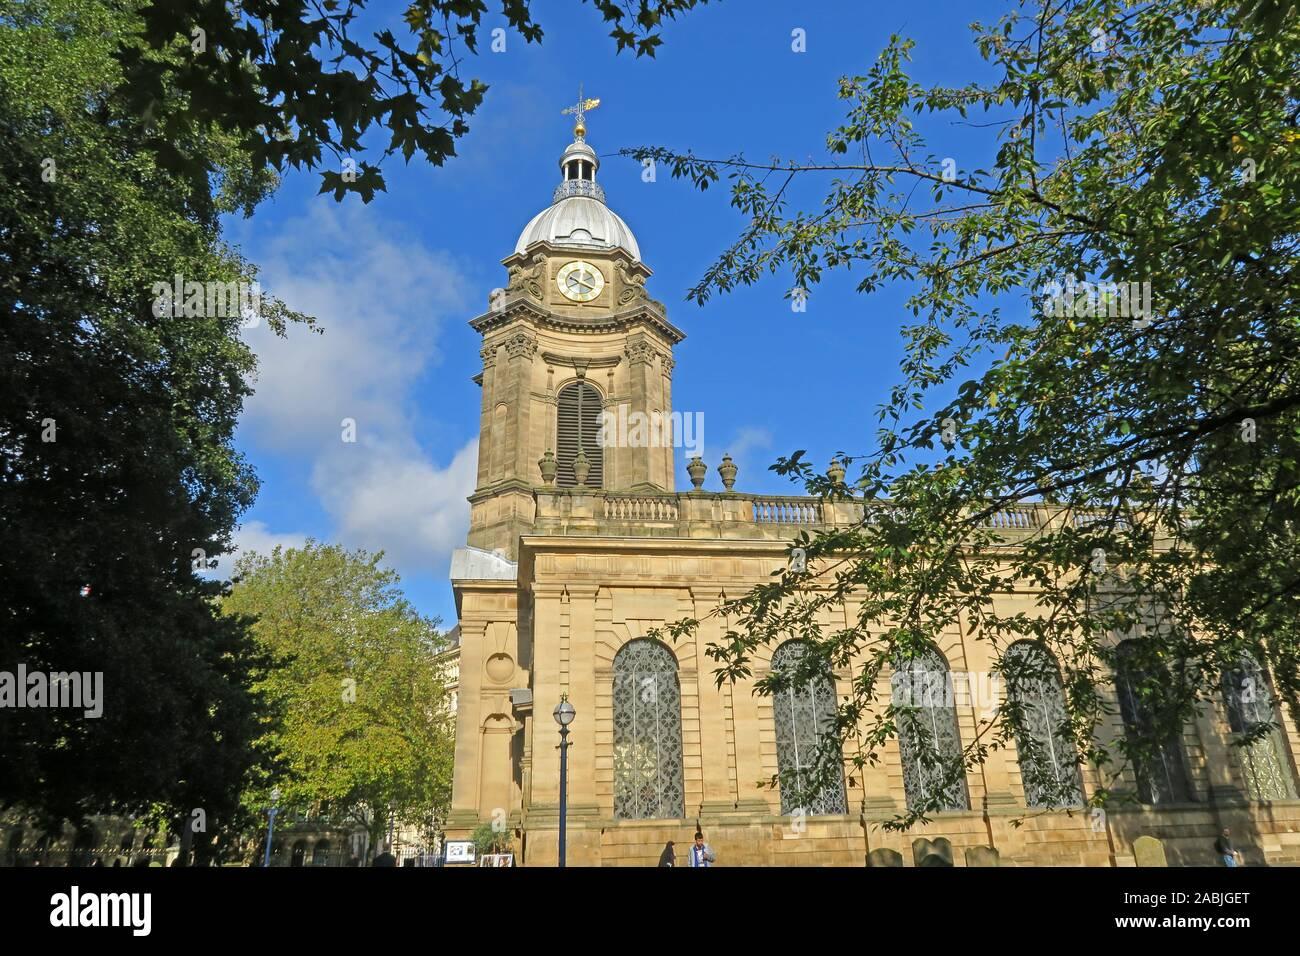 @HotpixUK,HotpixUK,GoTonySmith,UK,Birmingham,City Centre,West Midlands,England,Anglican,cathedral,B3 2QB,city centre,outside,Exterior and dome,dome,Birmingham cathedral,trees,summer